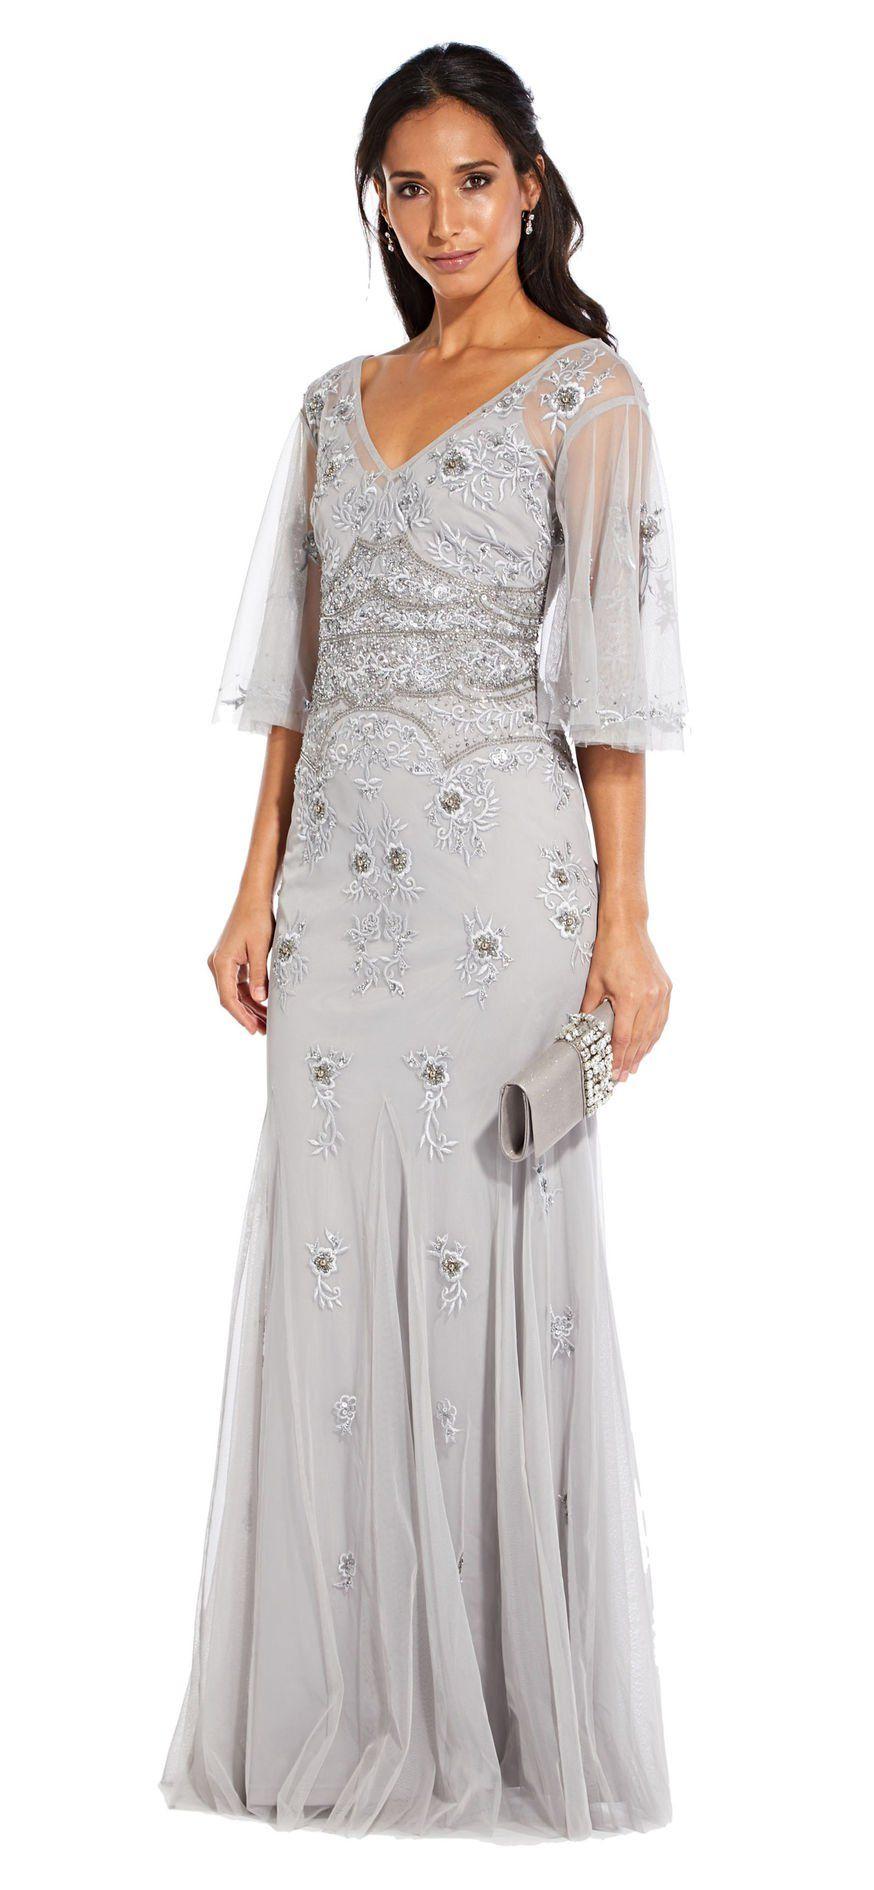 46+ Sheer sleeve wedding gowns ideas